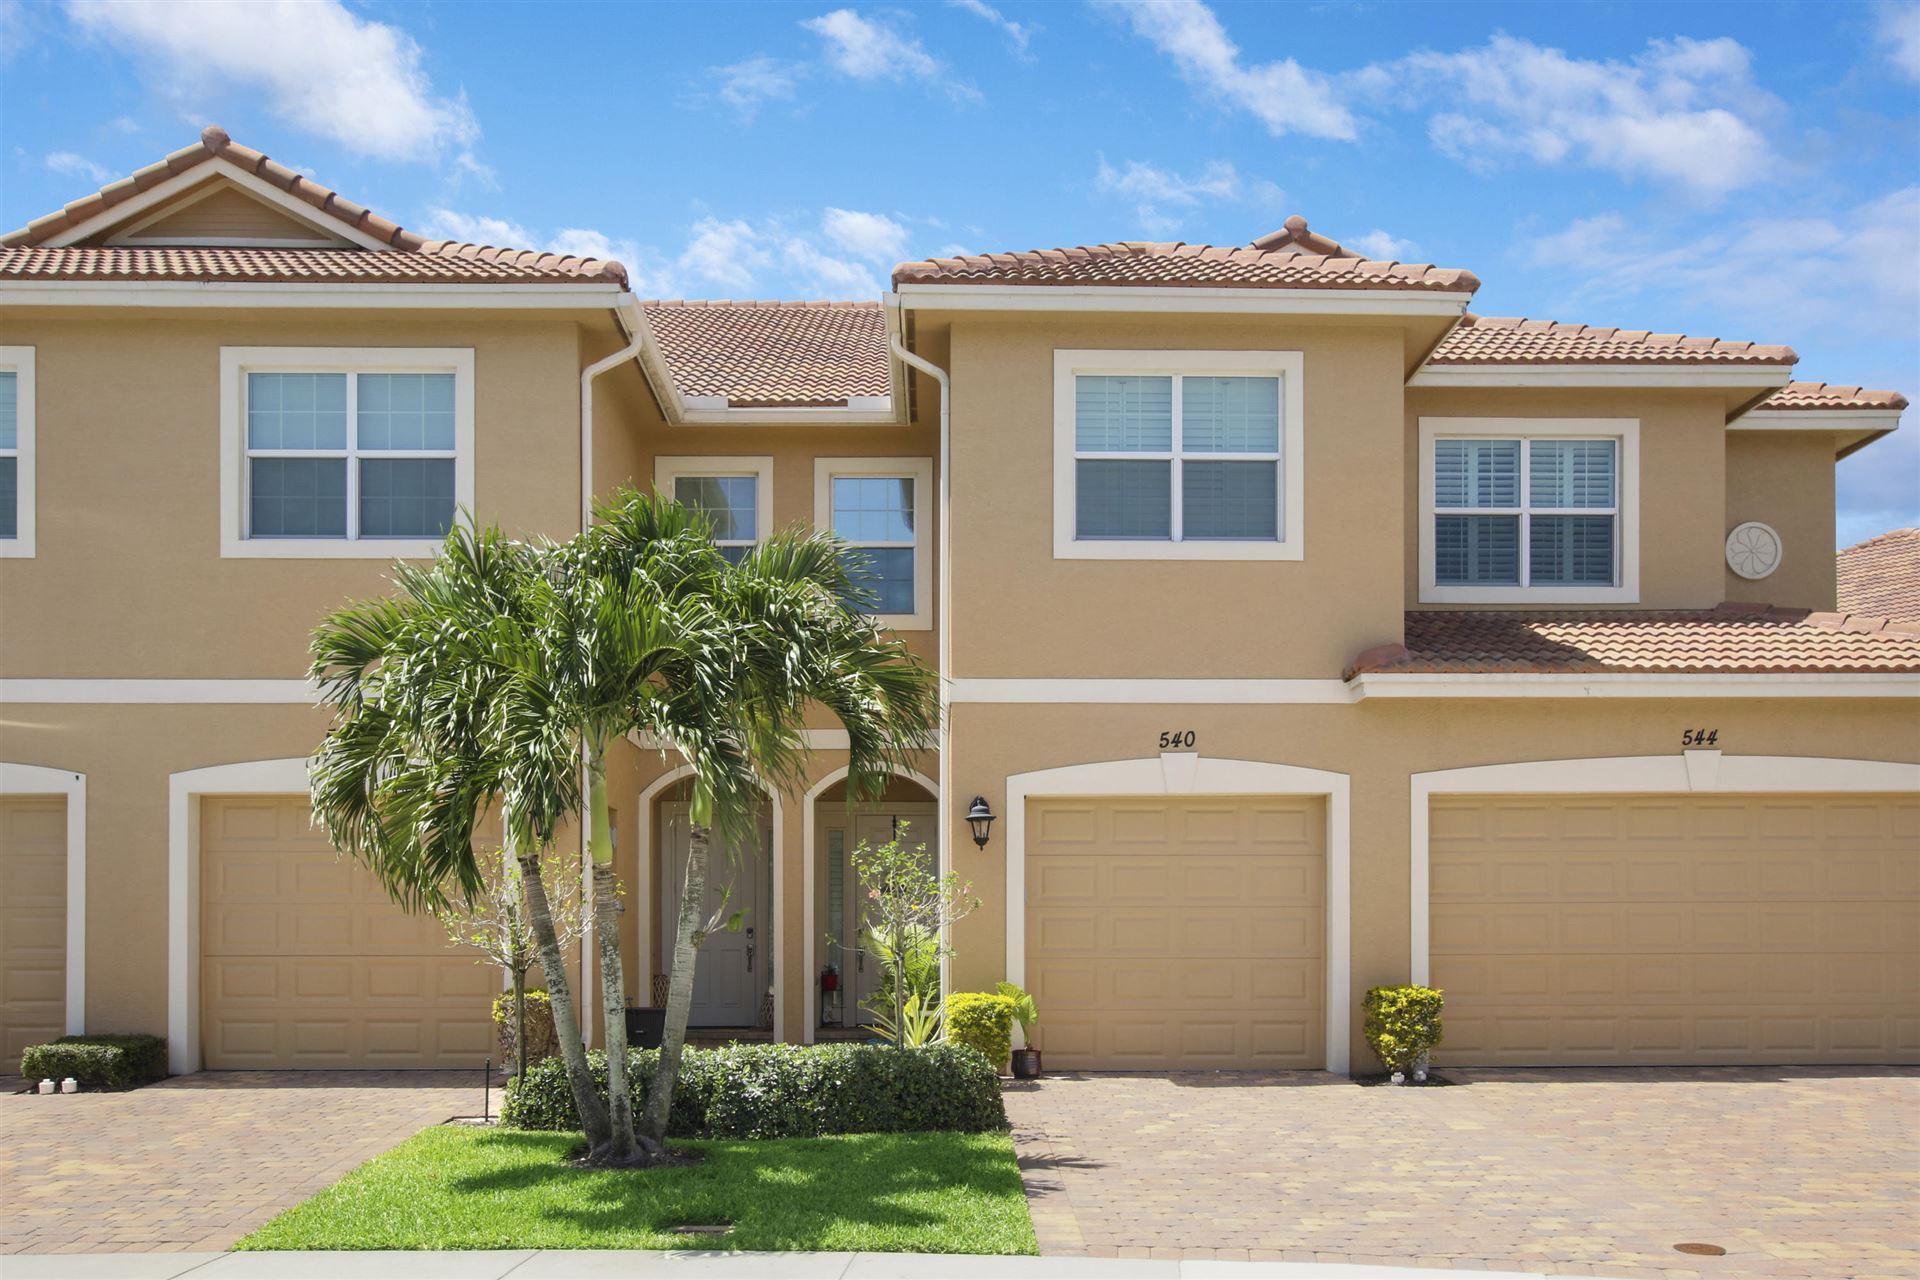 540 SW Glen Crest Way, Stuart, FL 34997 - #: RX-10652291